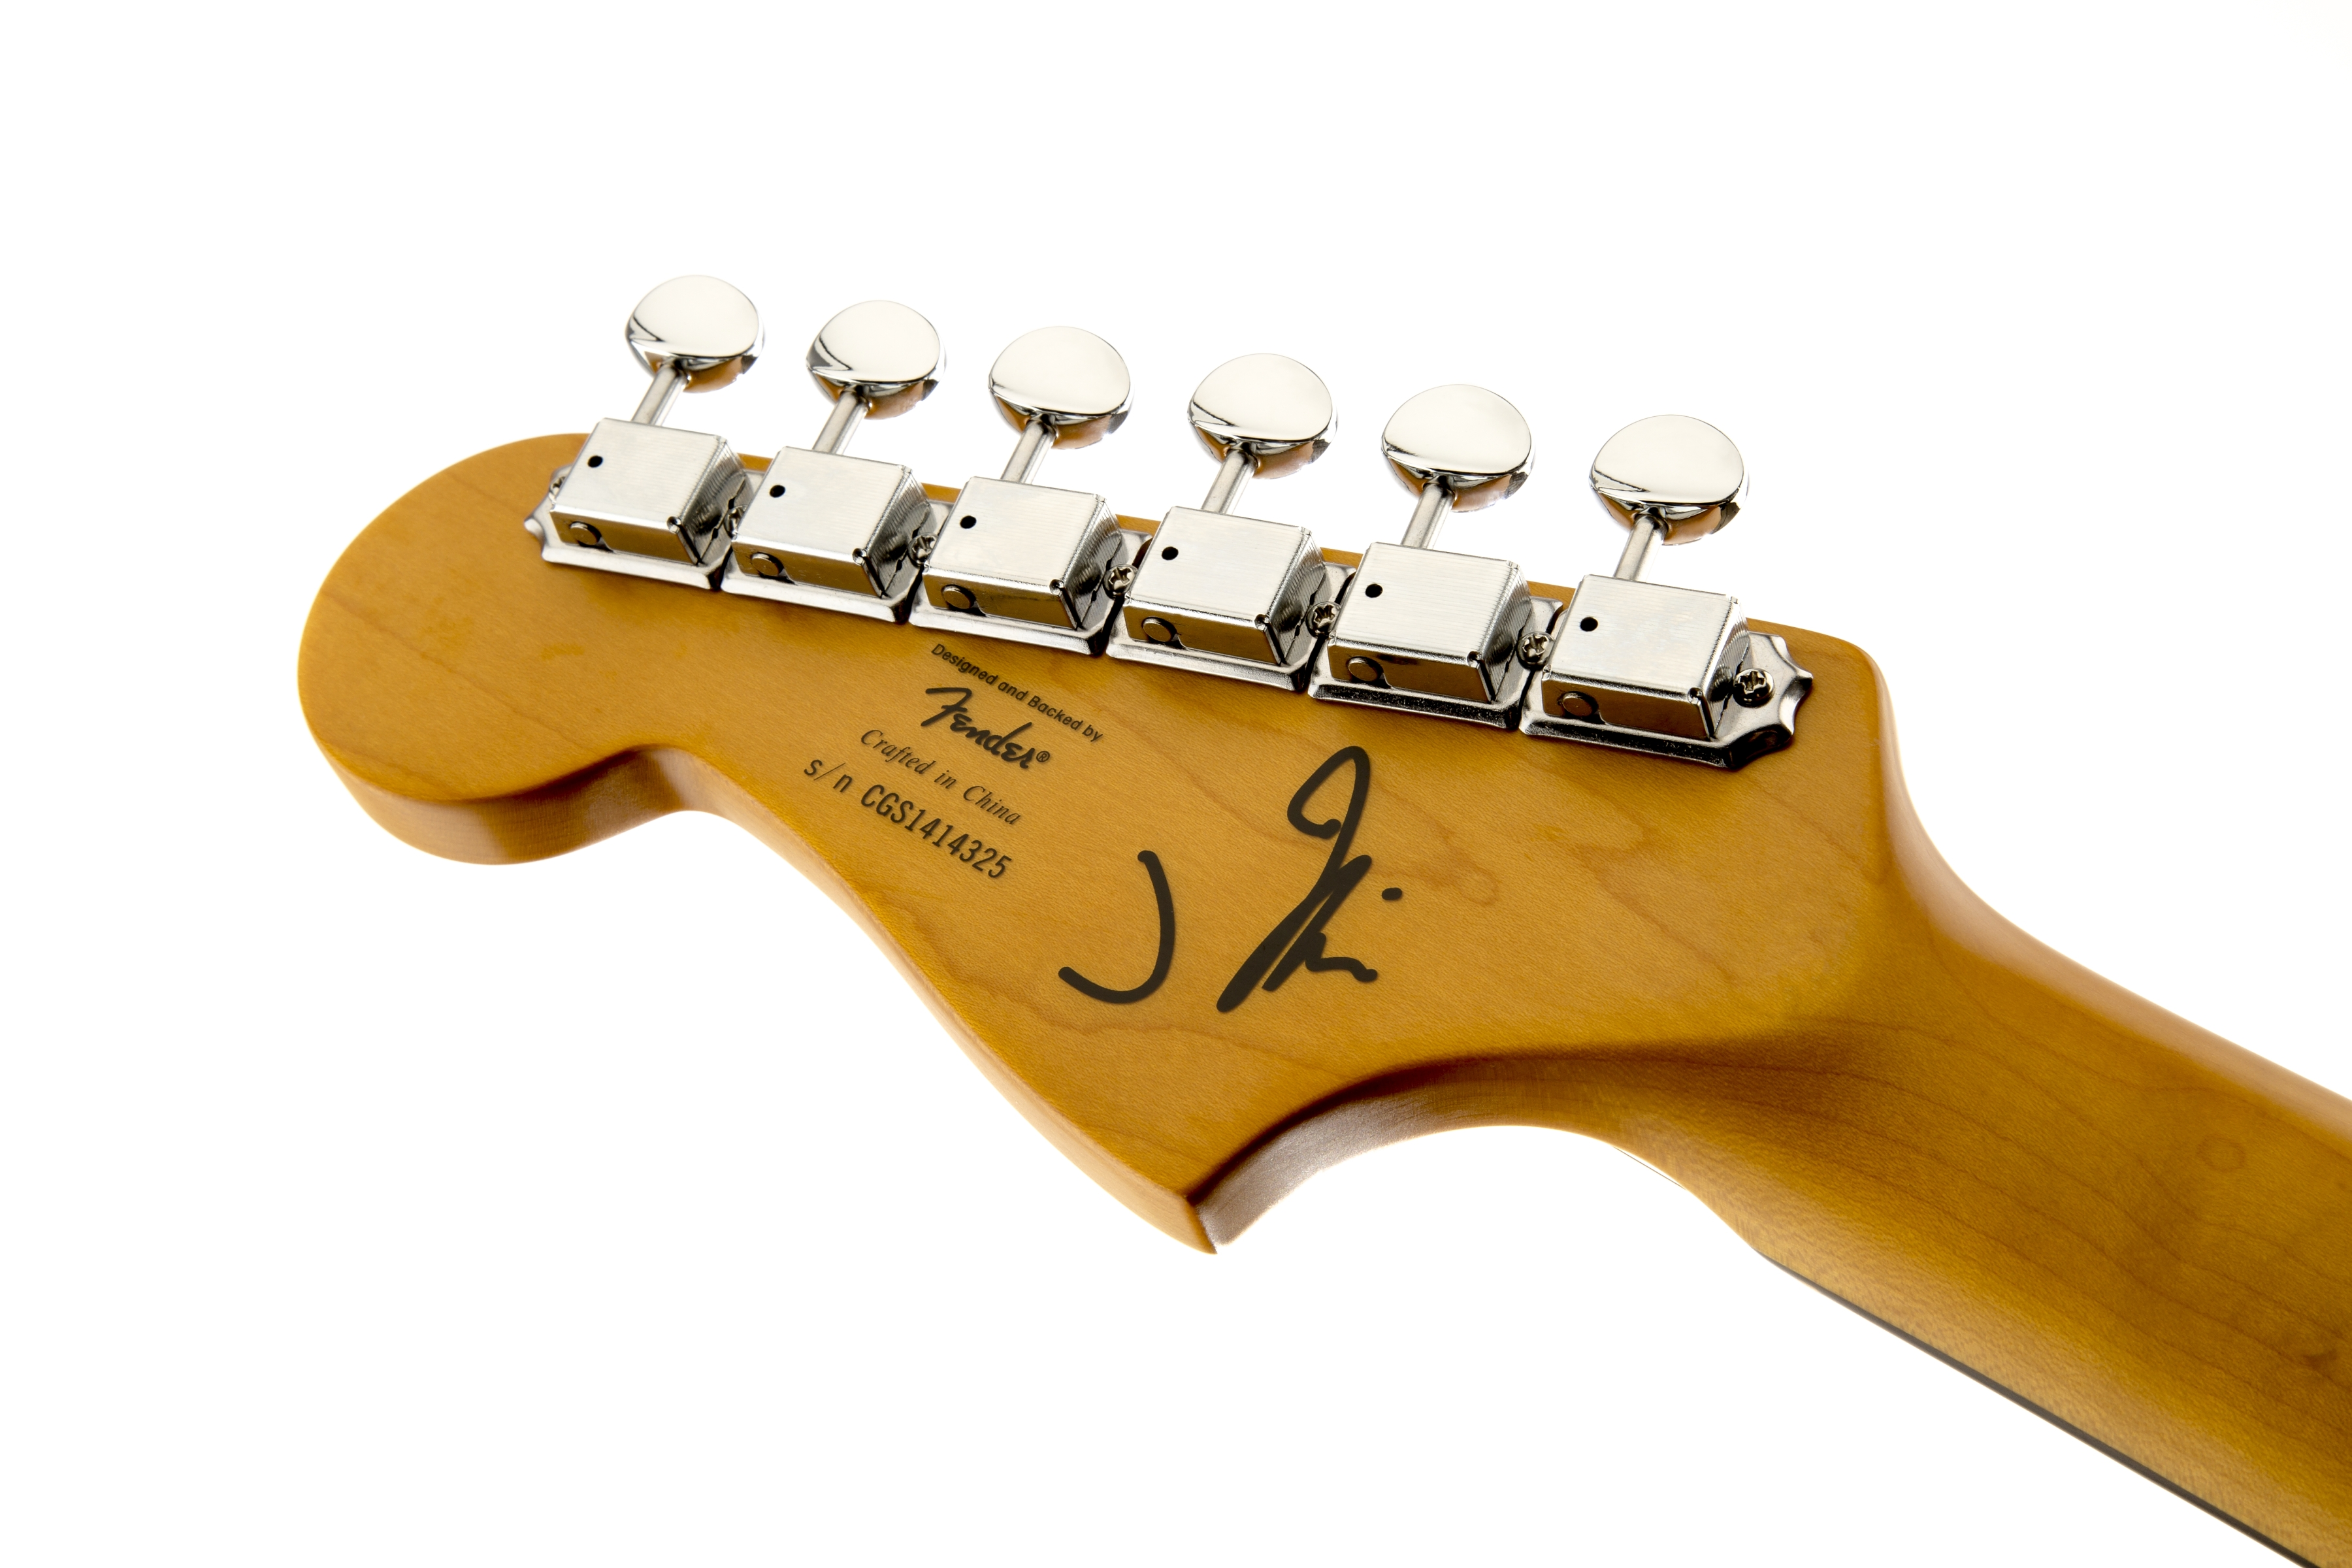 J Mascis Jazzmaster Squier Electric Guitars Aluminum Body Stratocaster Wiring Diagram